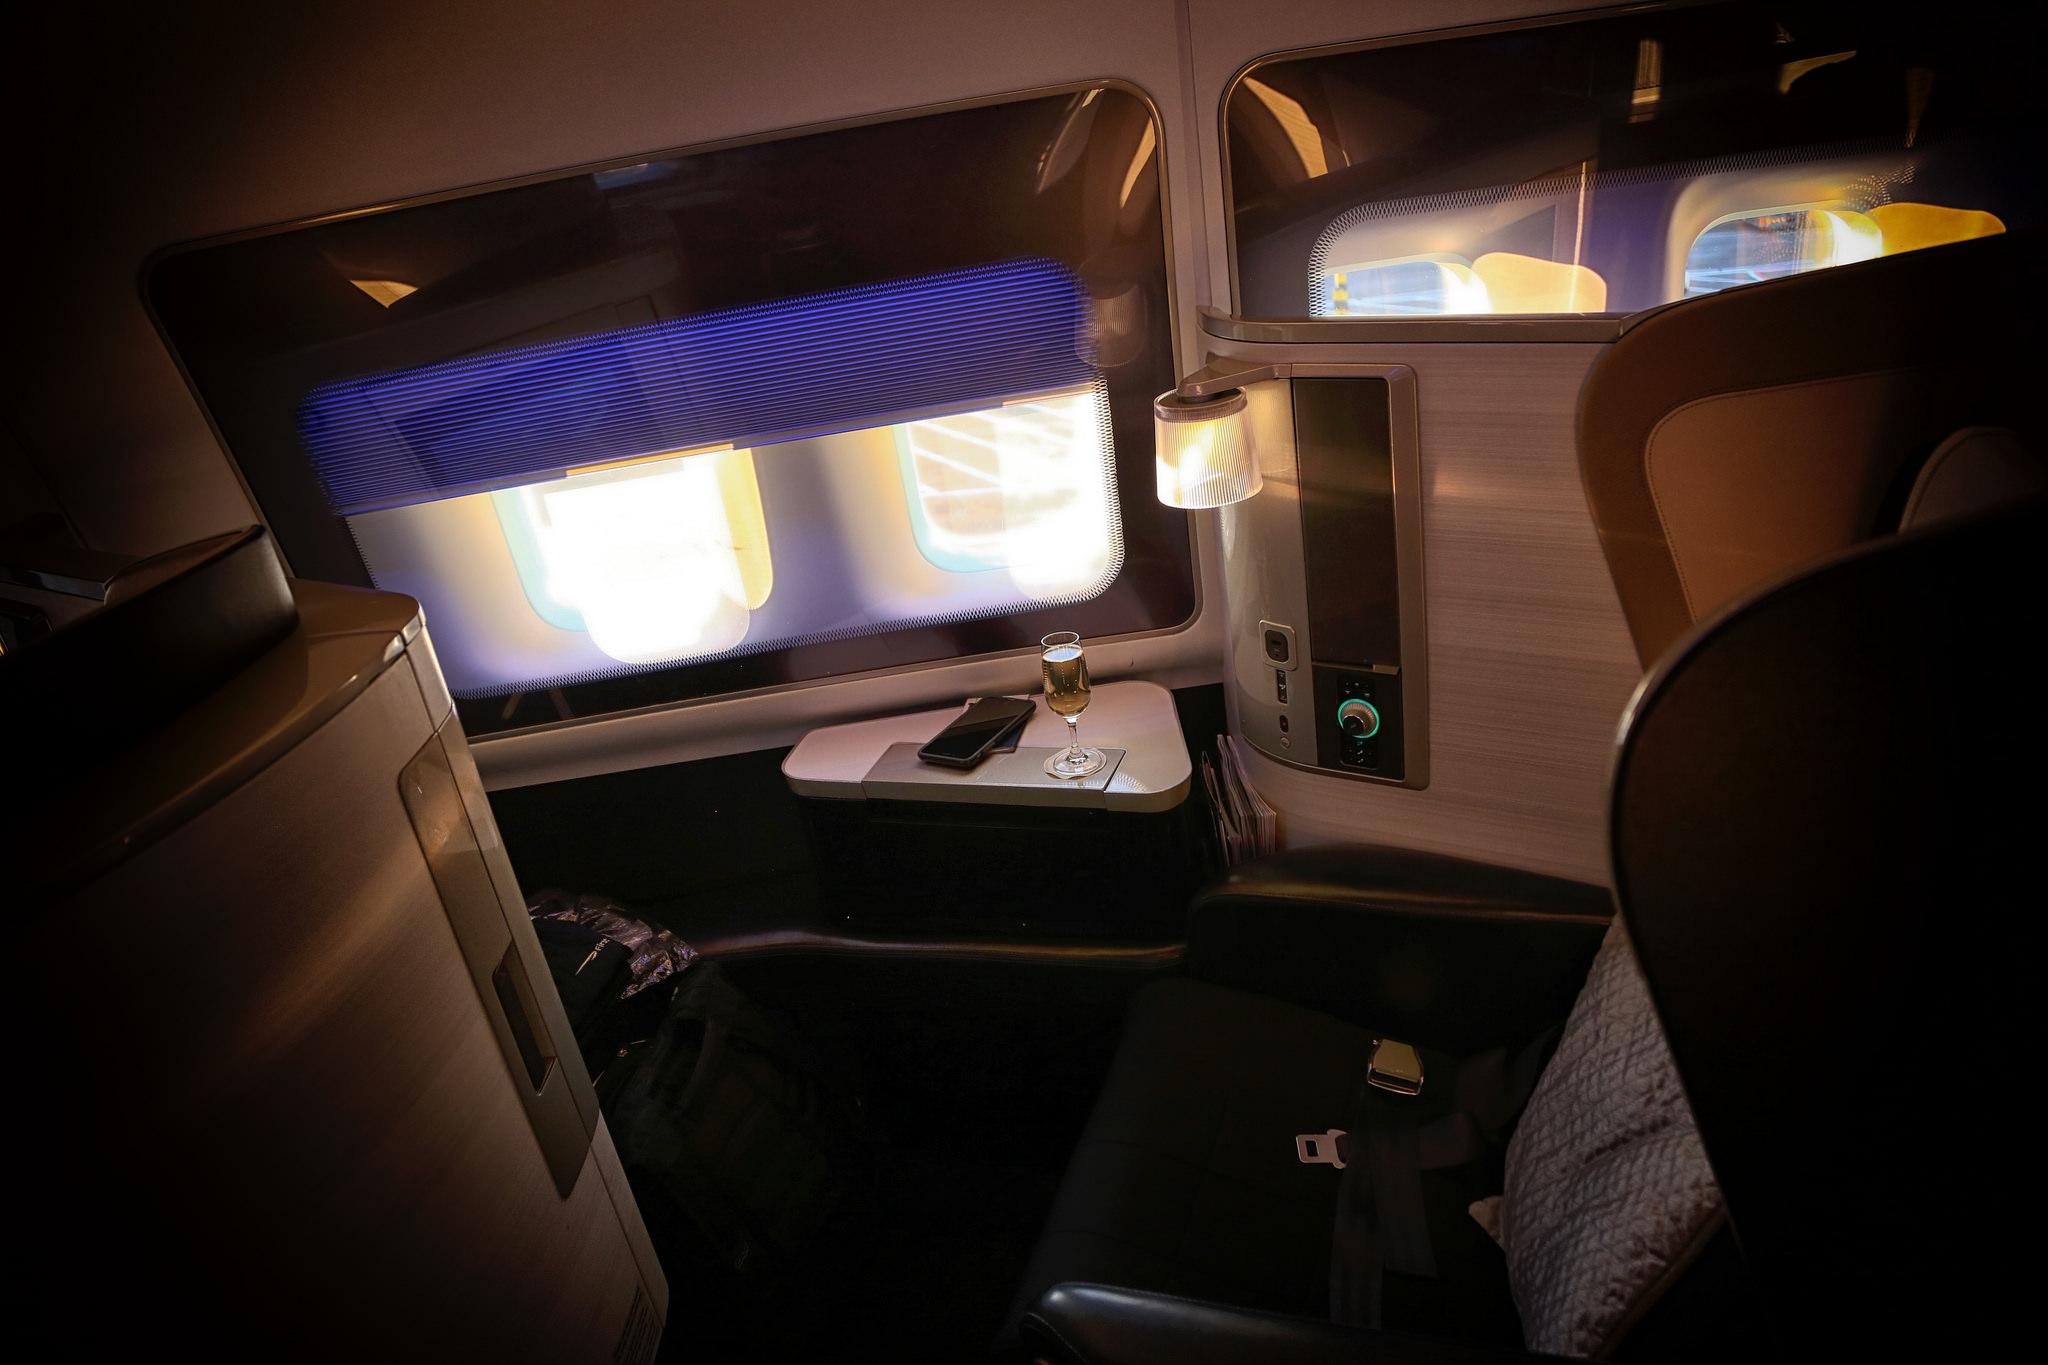 First class seat on British Airways with window shades halfway down